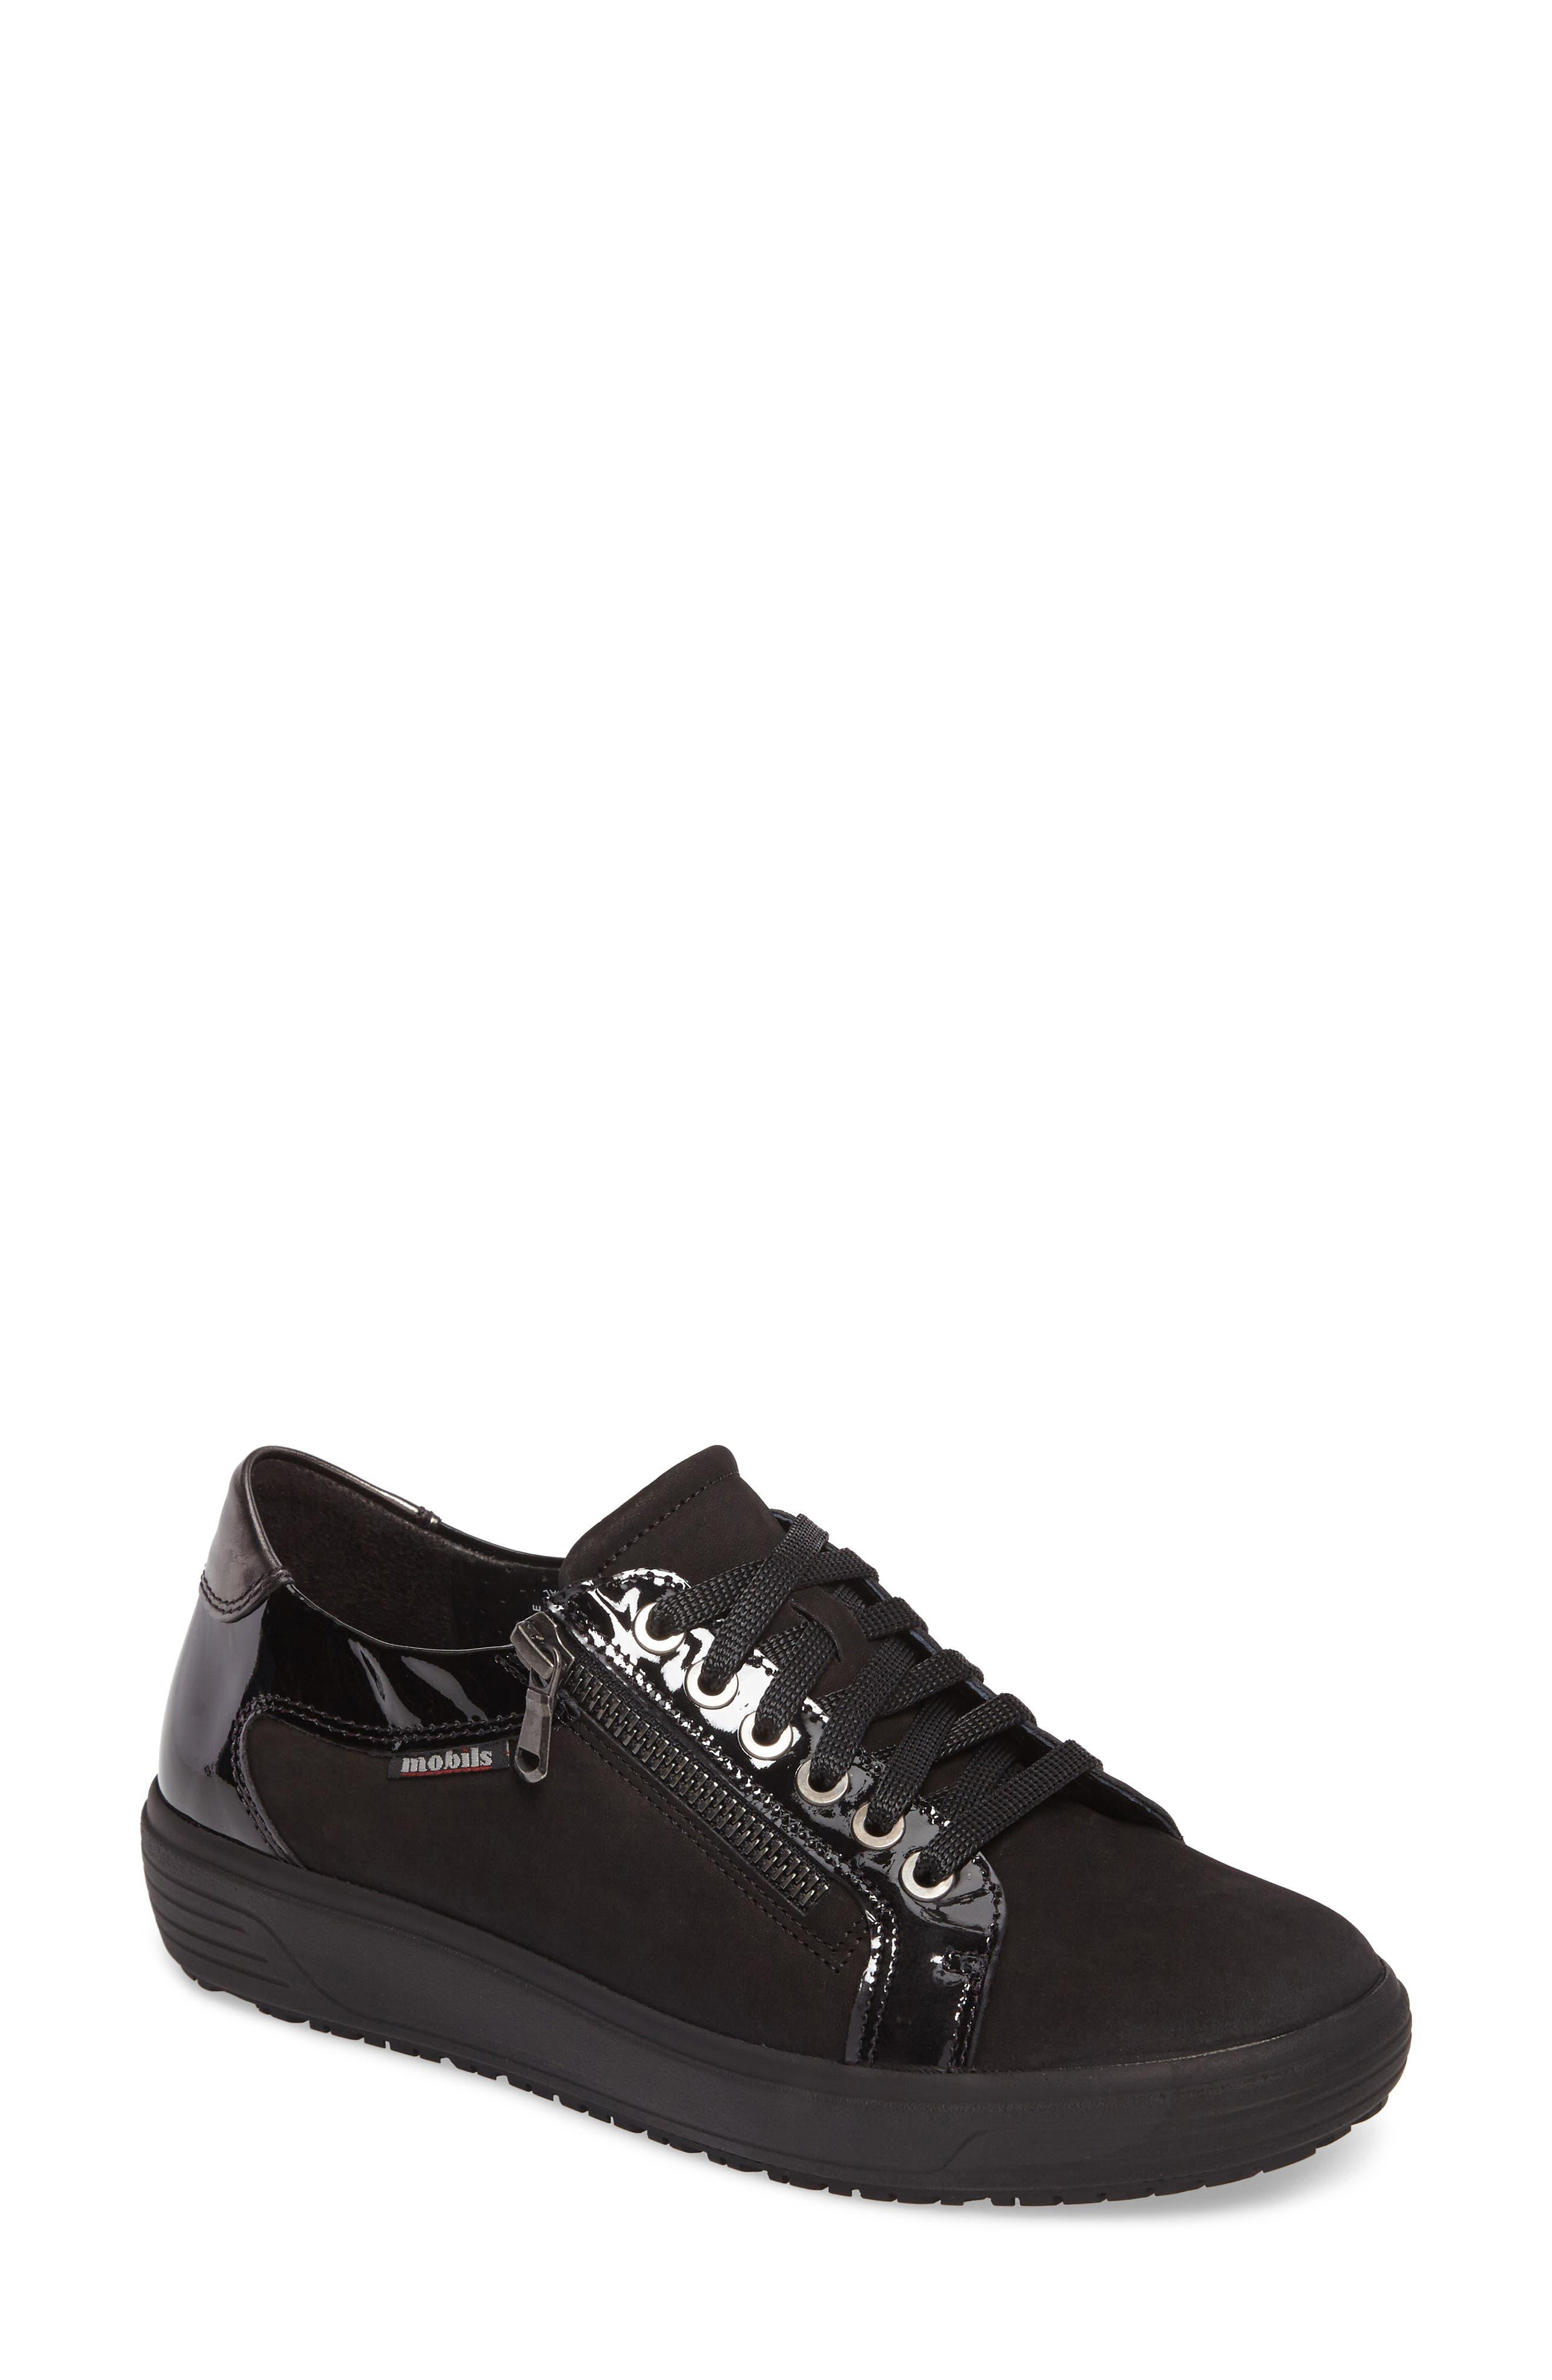 Lenza Sneaker,                         Main,                         color, 012